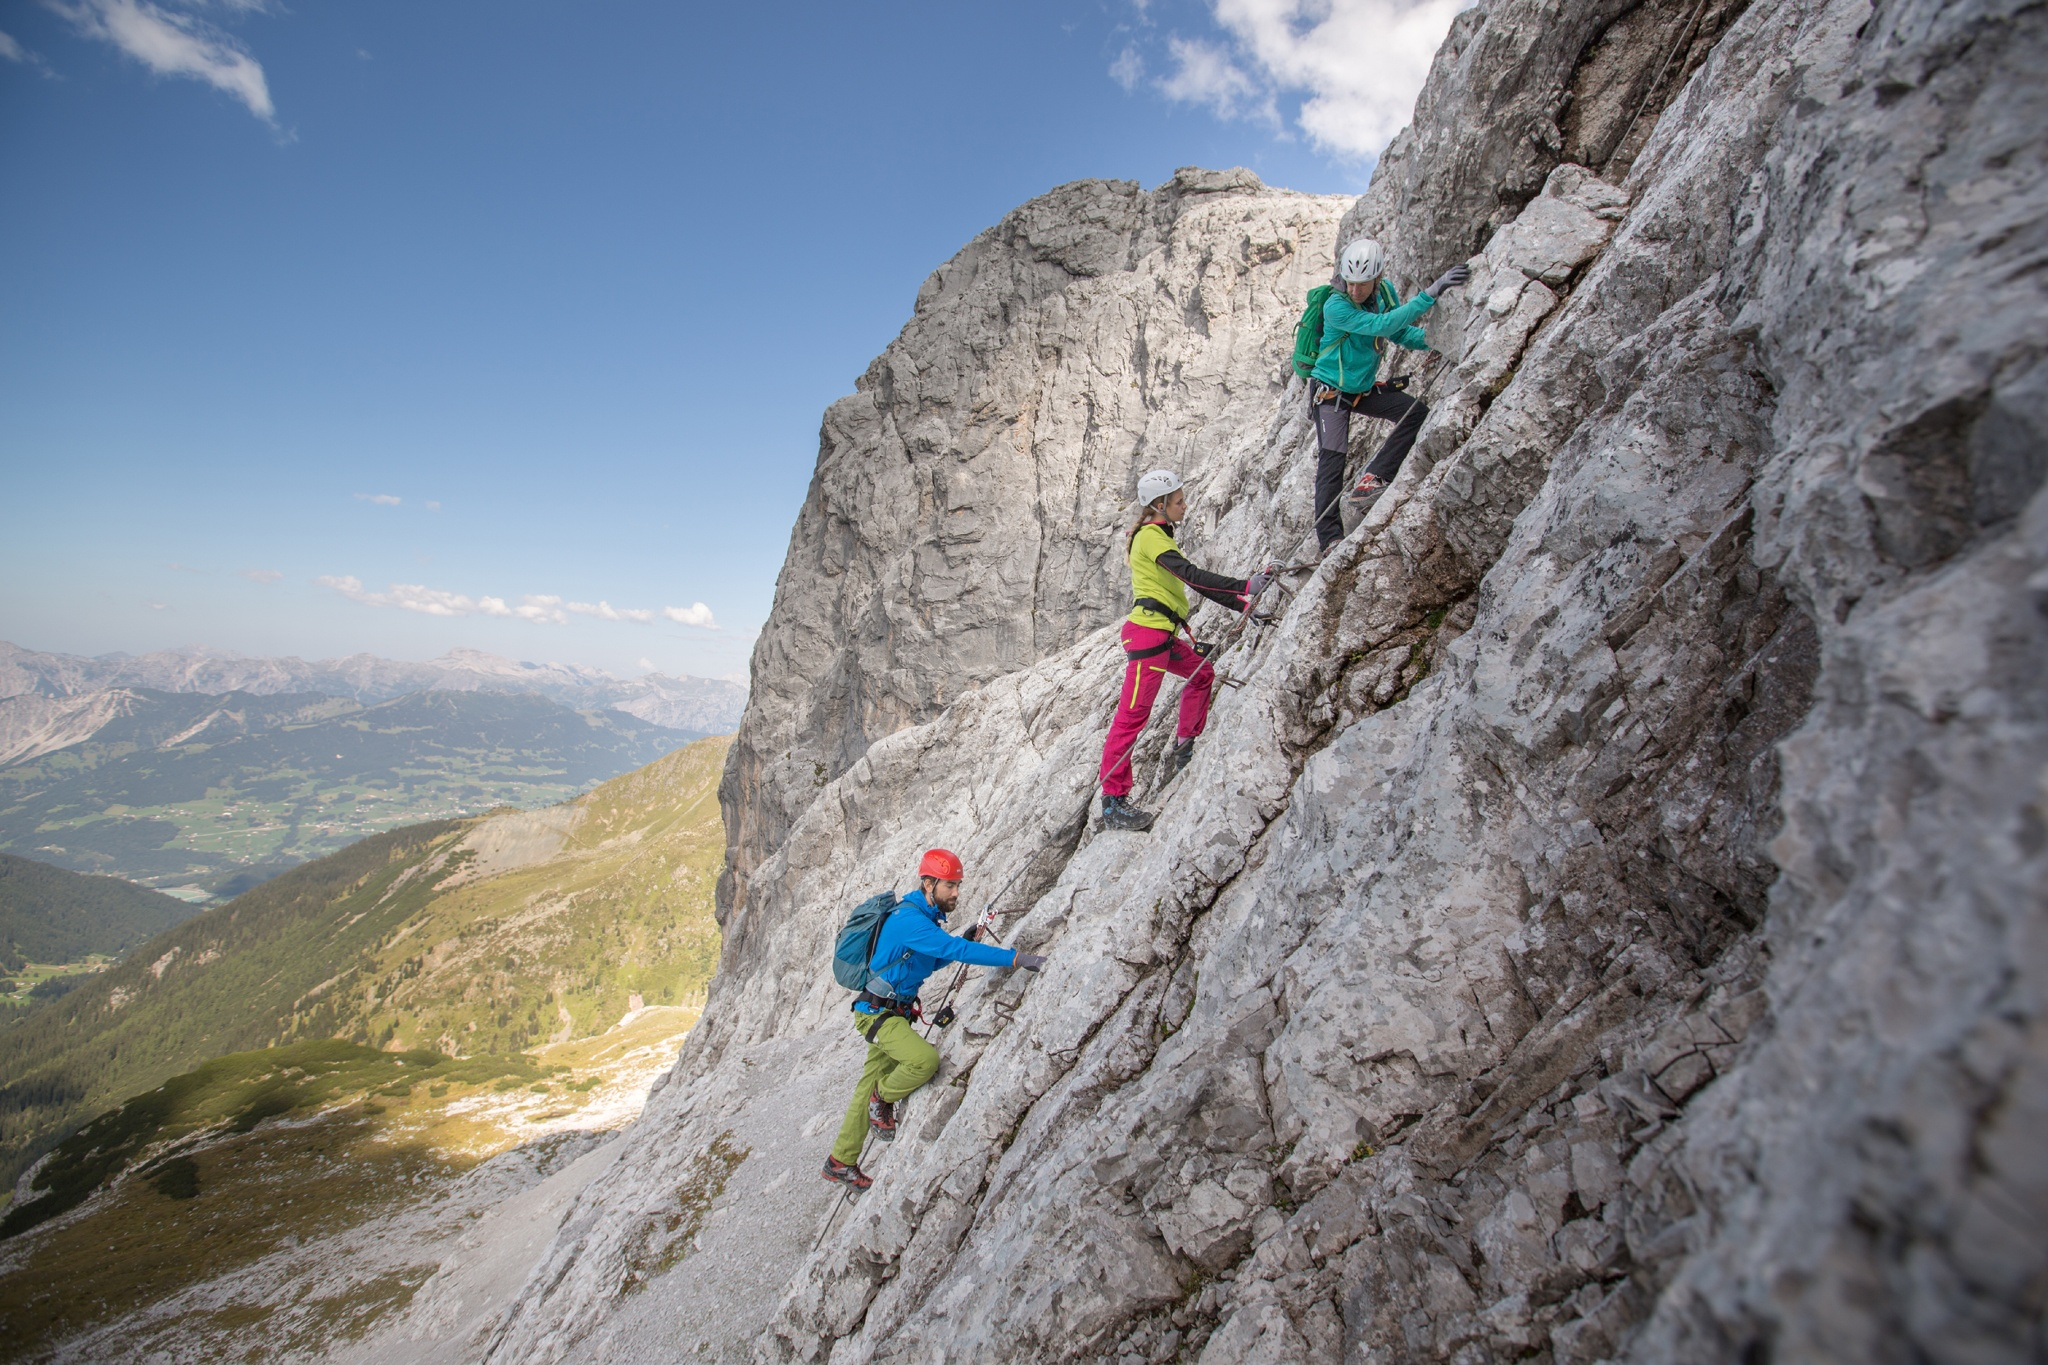 Klettersteig Netstal : Klettersteig indianer klettersteige